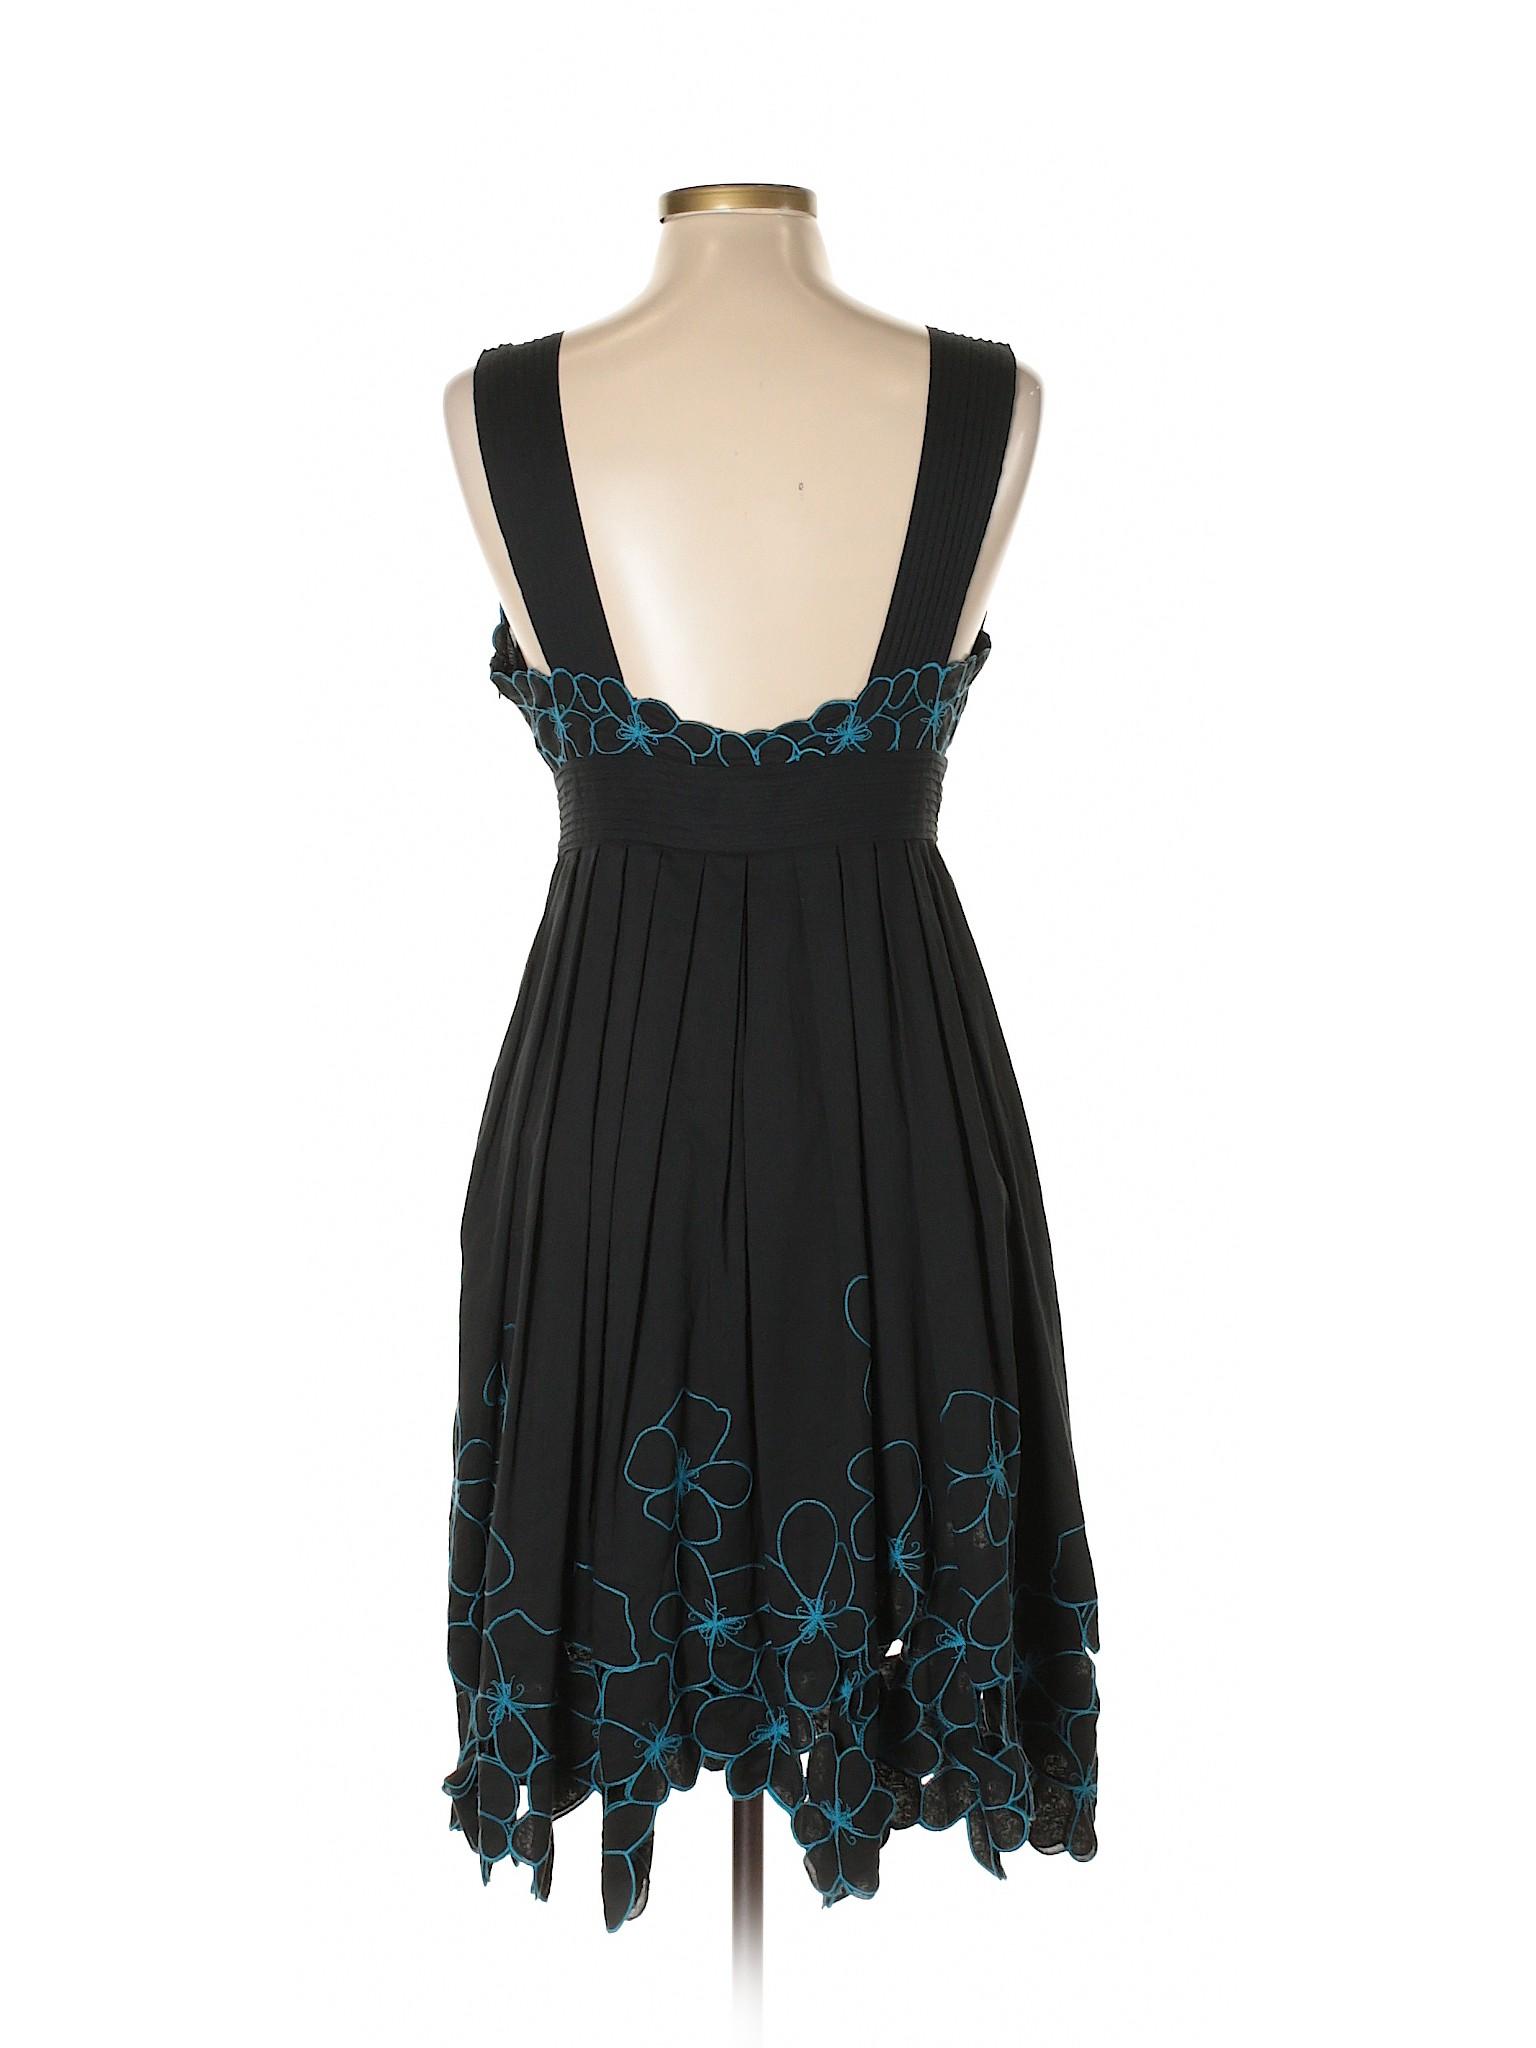 Winter Malandrino Boutique Casual Dress Catherine Zqx8x6Cw